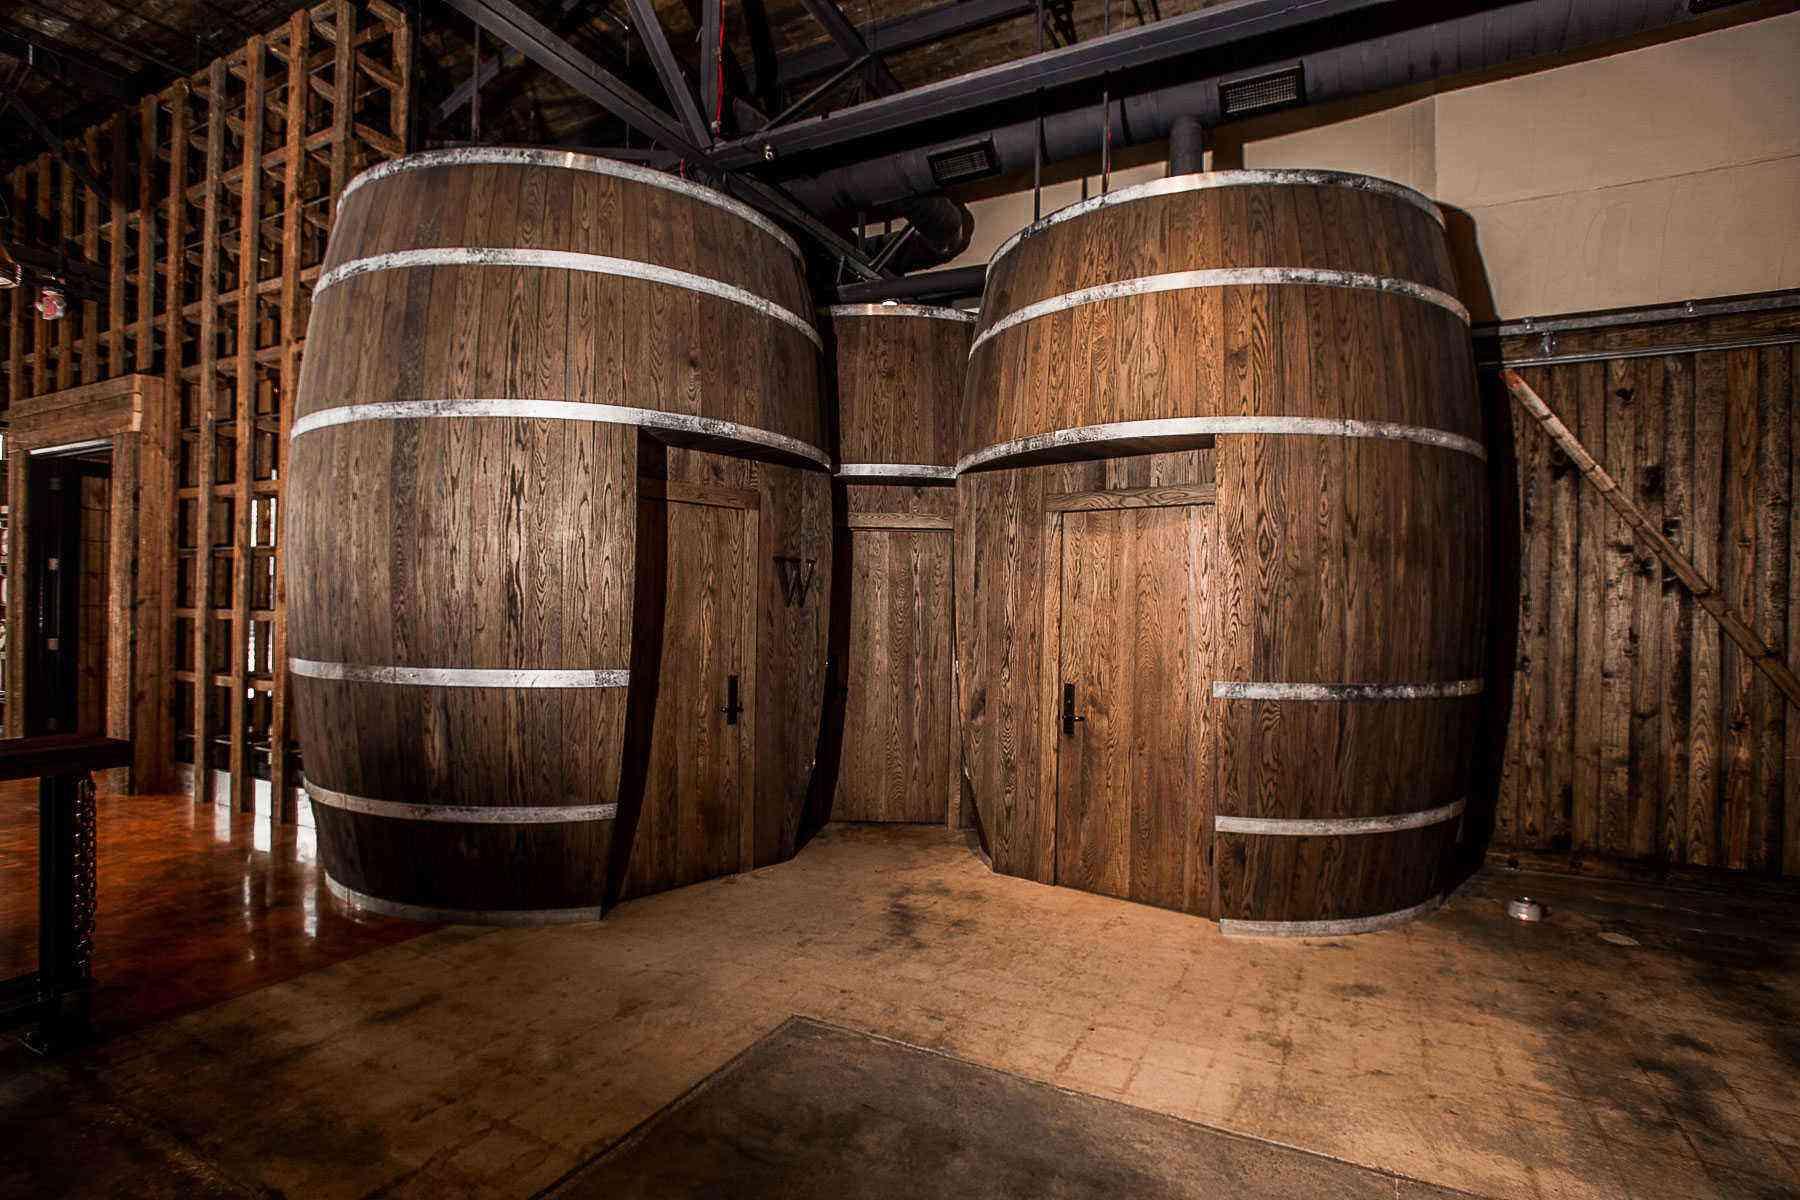 Amazing-Bathrooms-Charleston-Distilling-Co-1